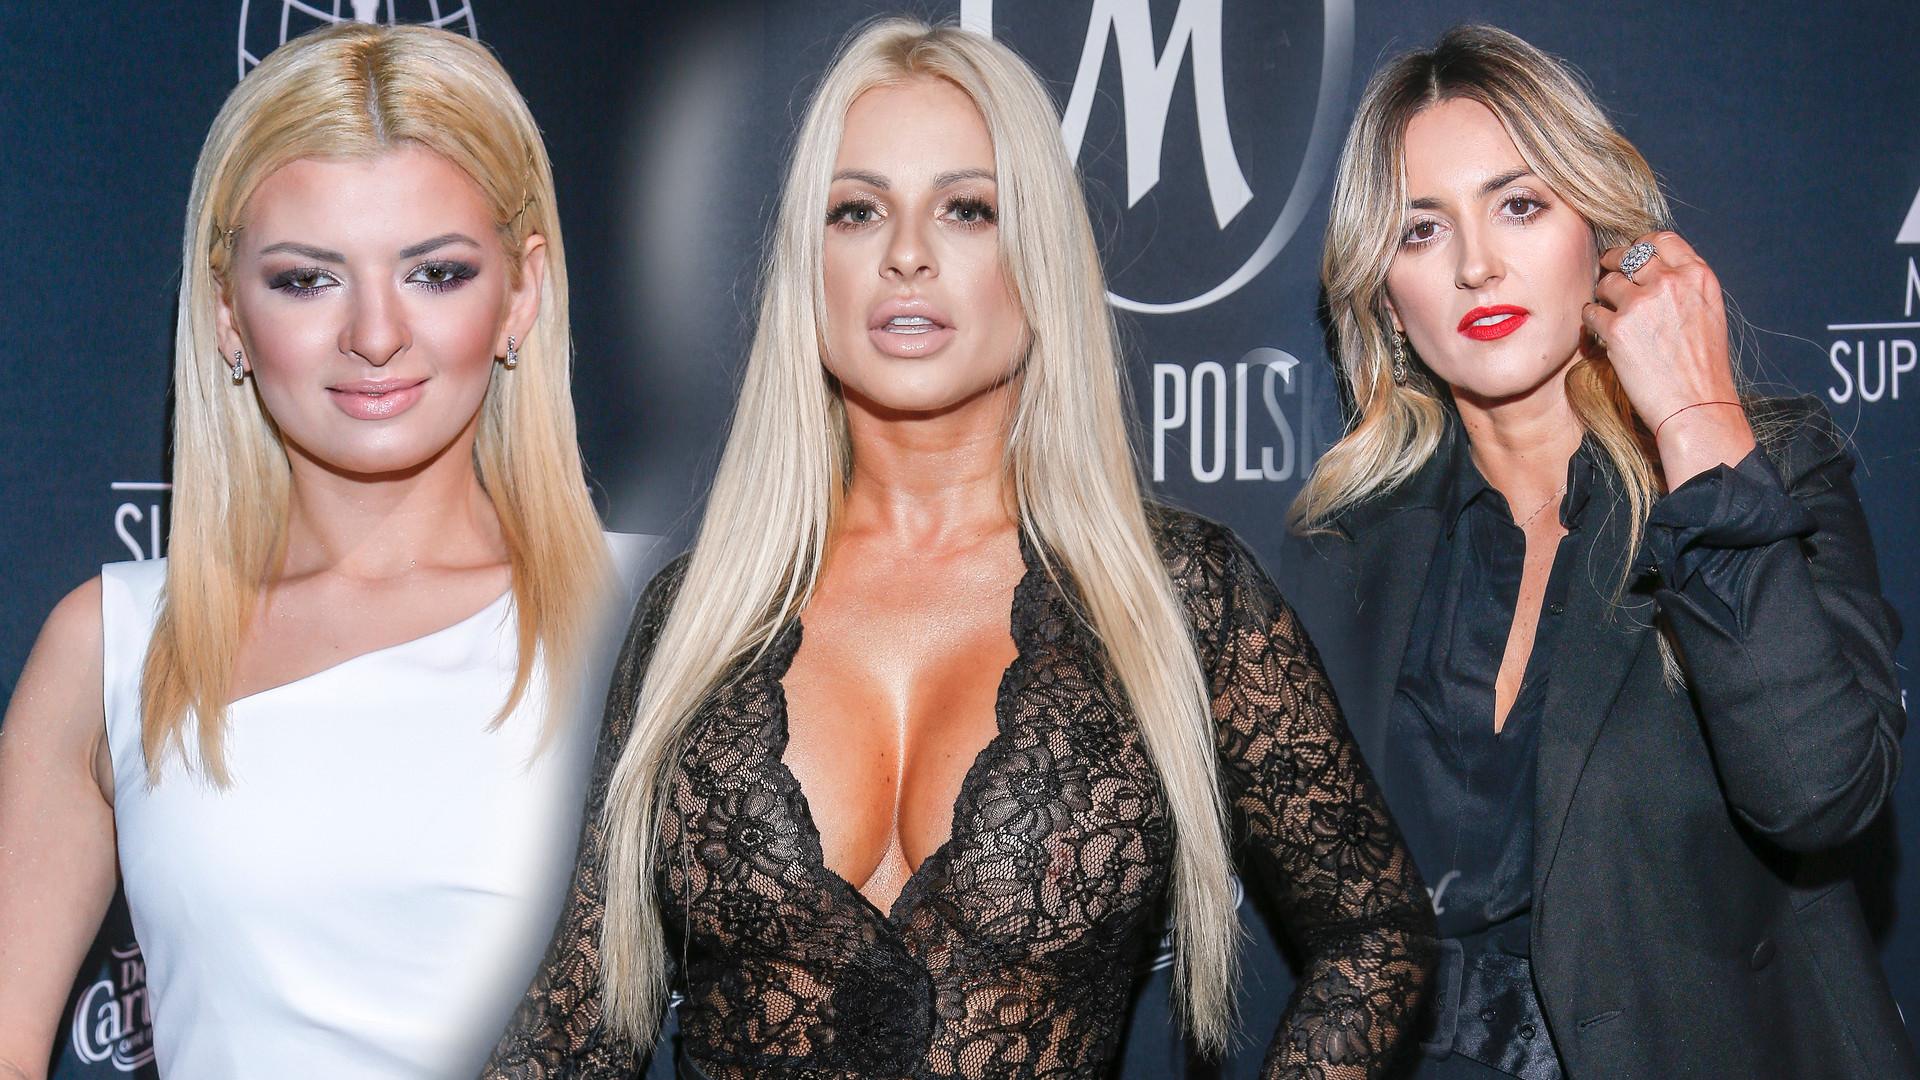 Natalia Szroeder, Karolina Szostak, Paula Tumala na Mister Supranational 2018